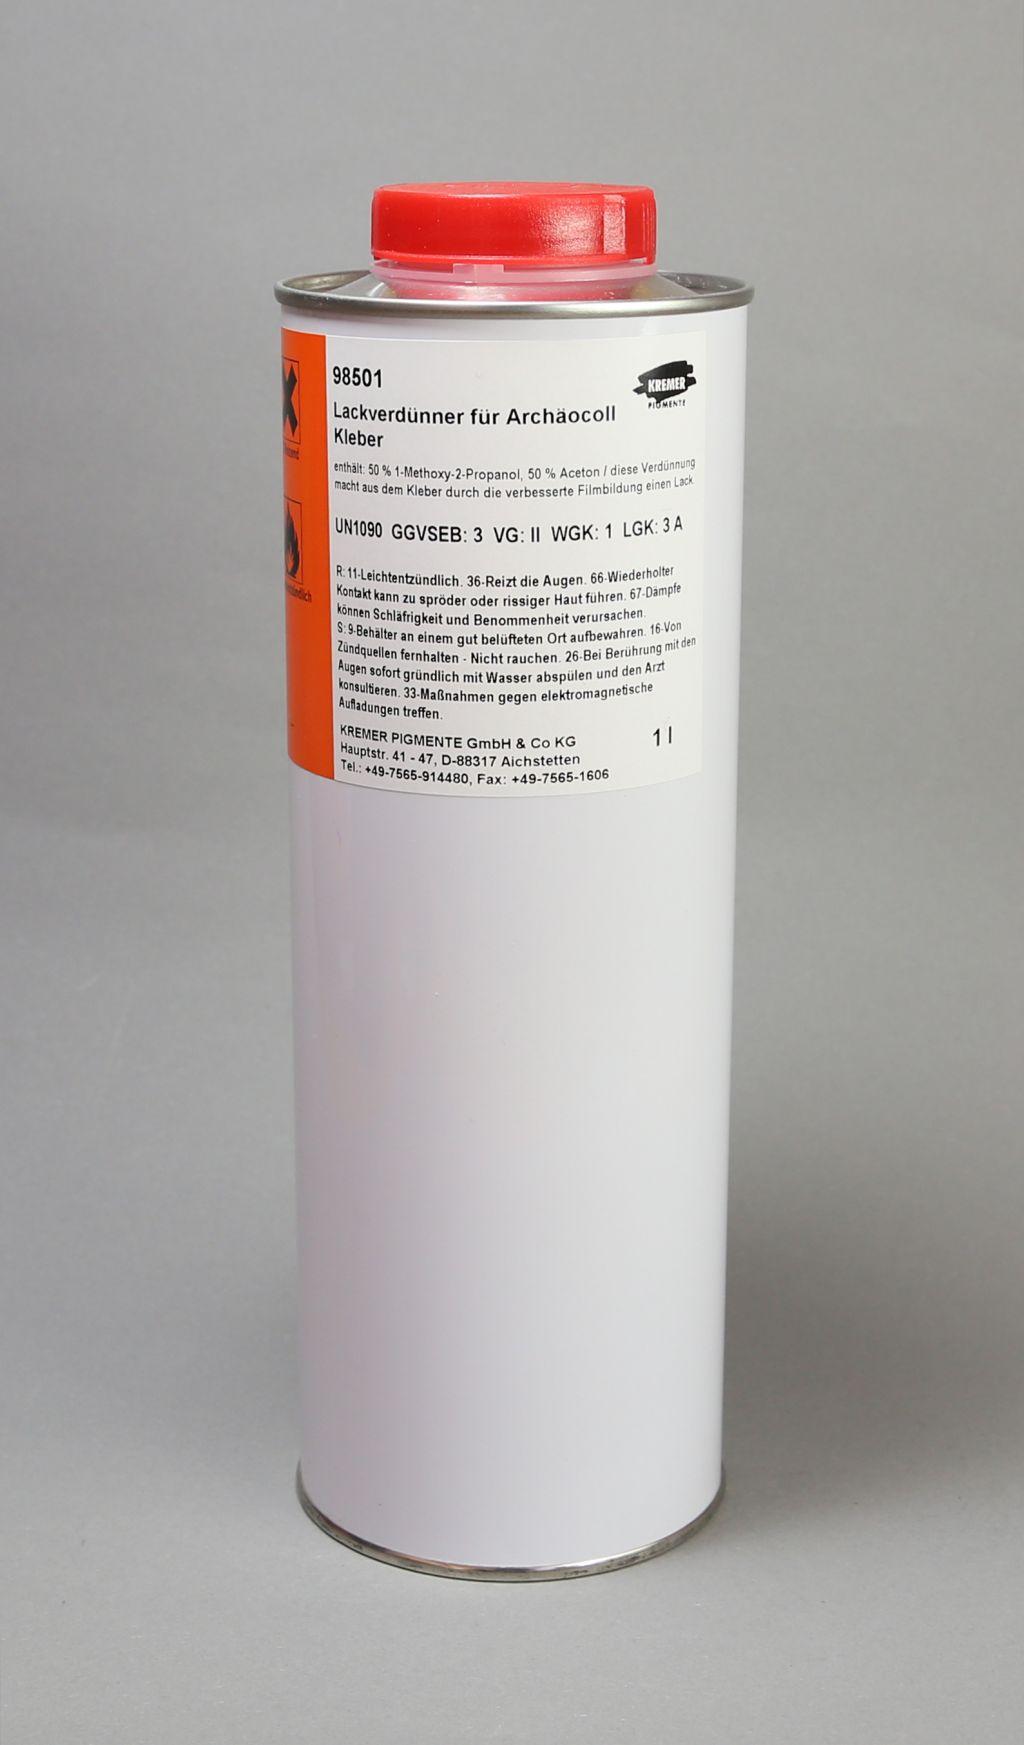 Acetone Paint Thinner : acetone, paint, thinner, Paint, Thinner, Archäocoll, 2000,, Ceramic, Mediums,, Binders, Glues, Kremer, Pigments, Online